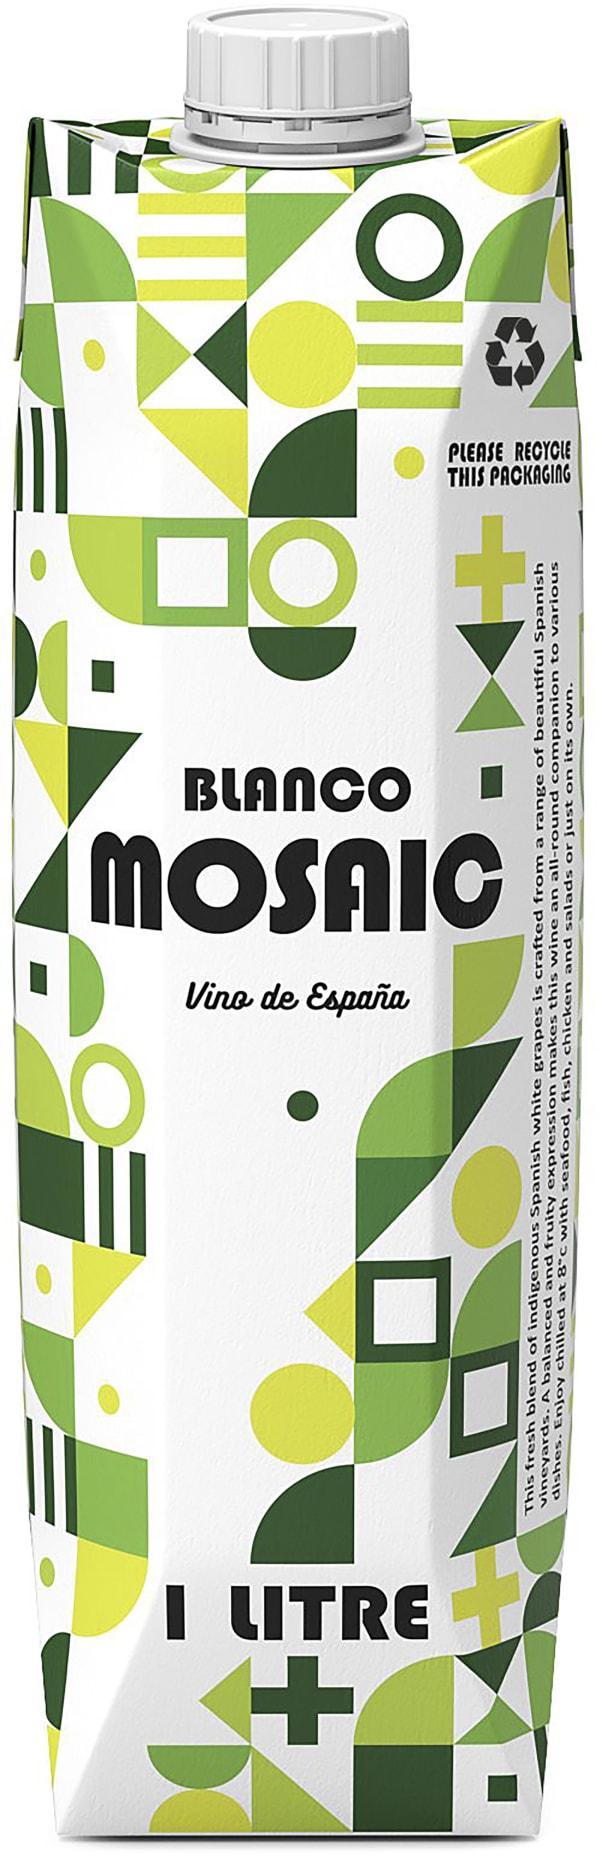 Mosaic Blanco carton package